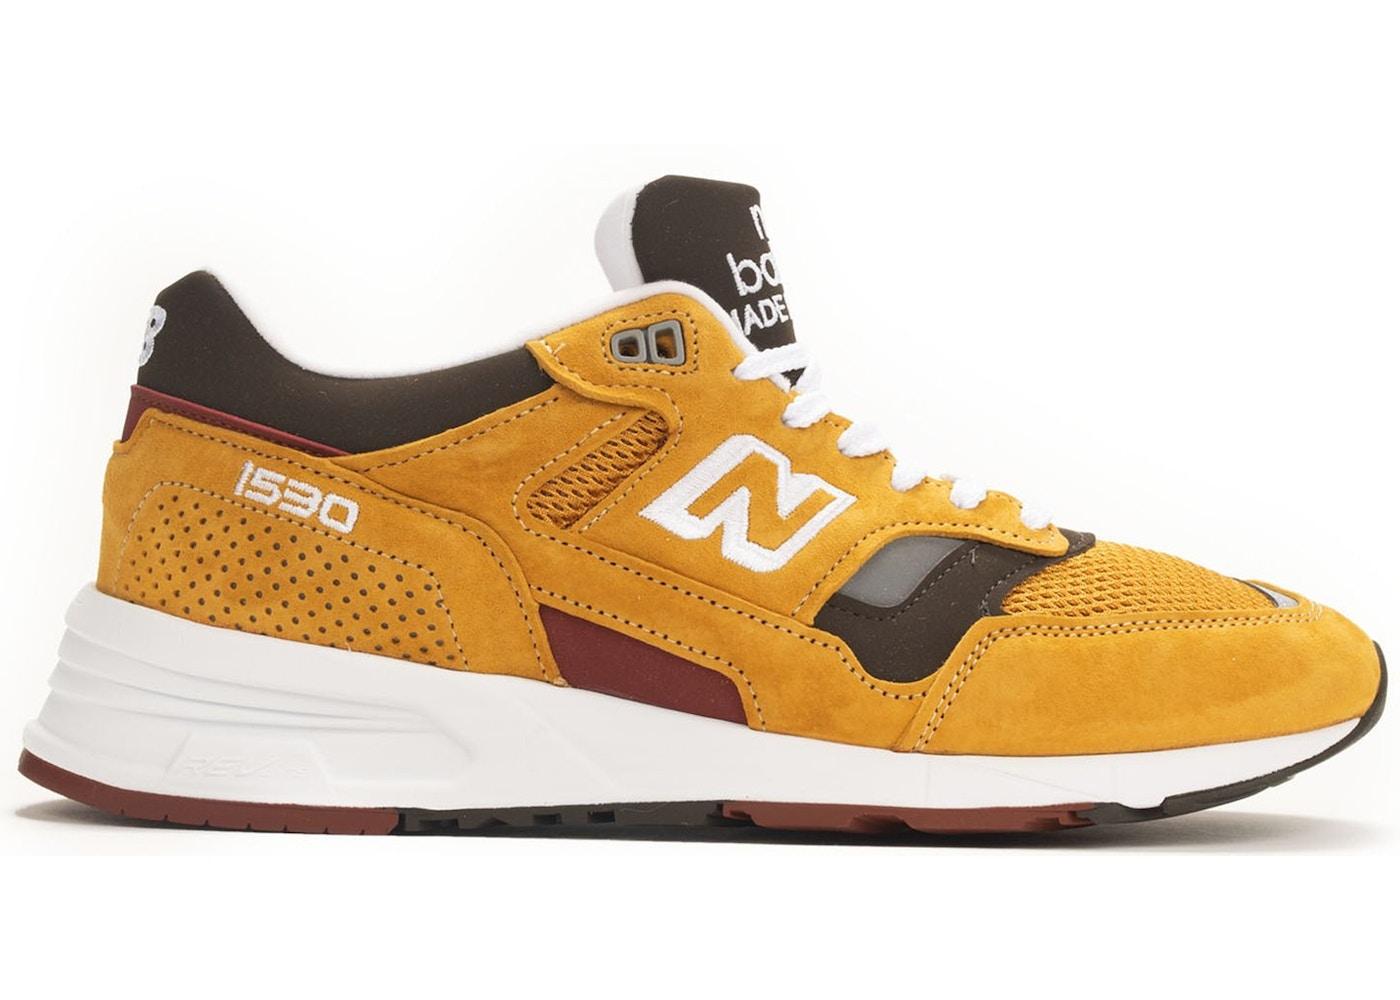 New Balance 1530 Yellow